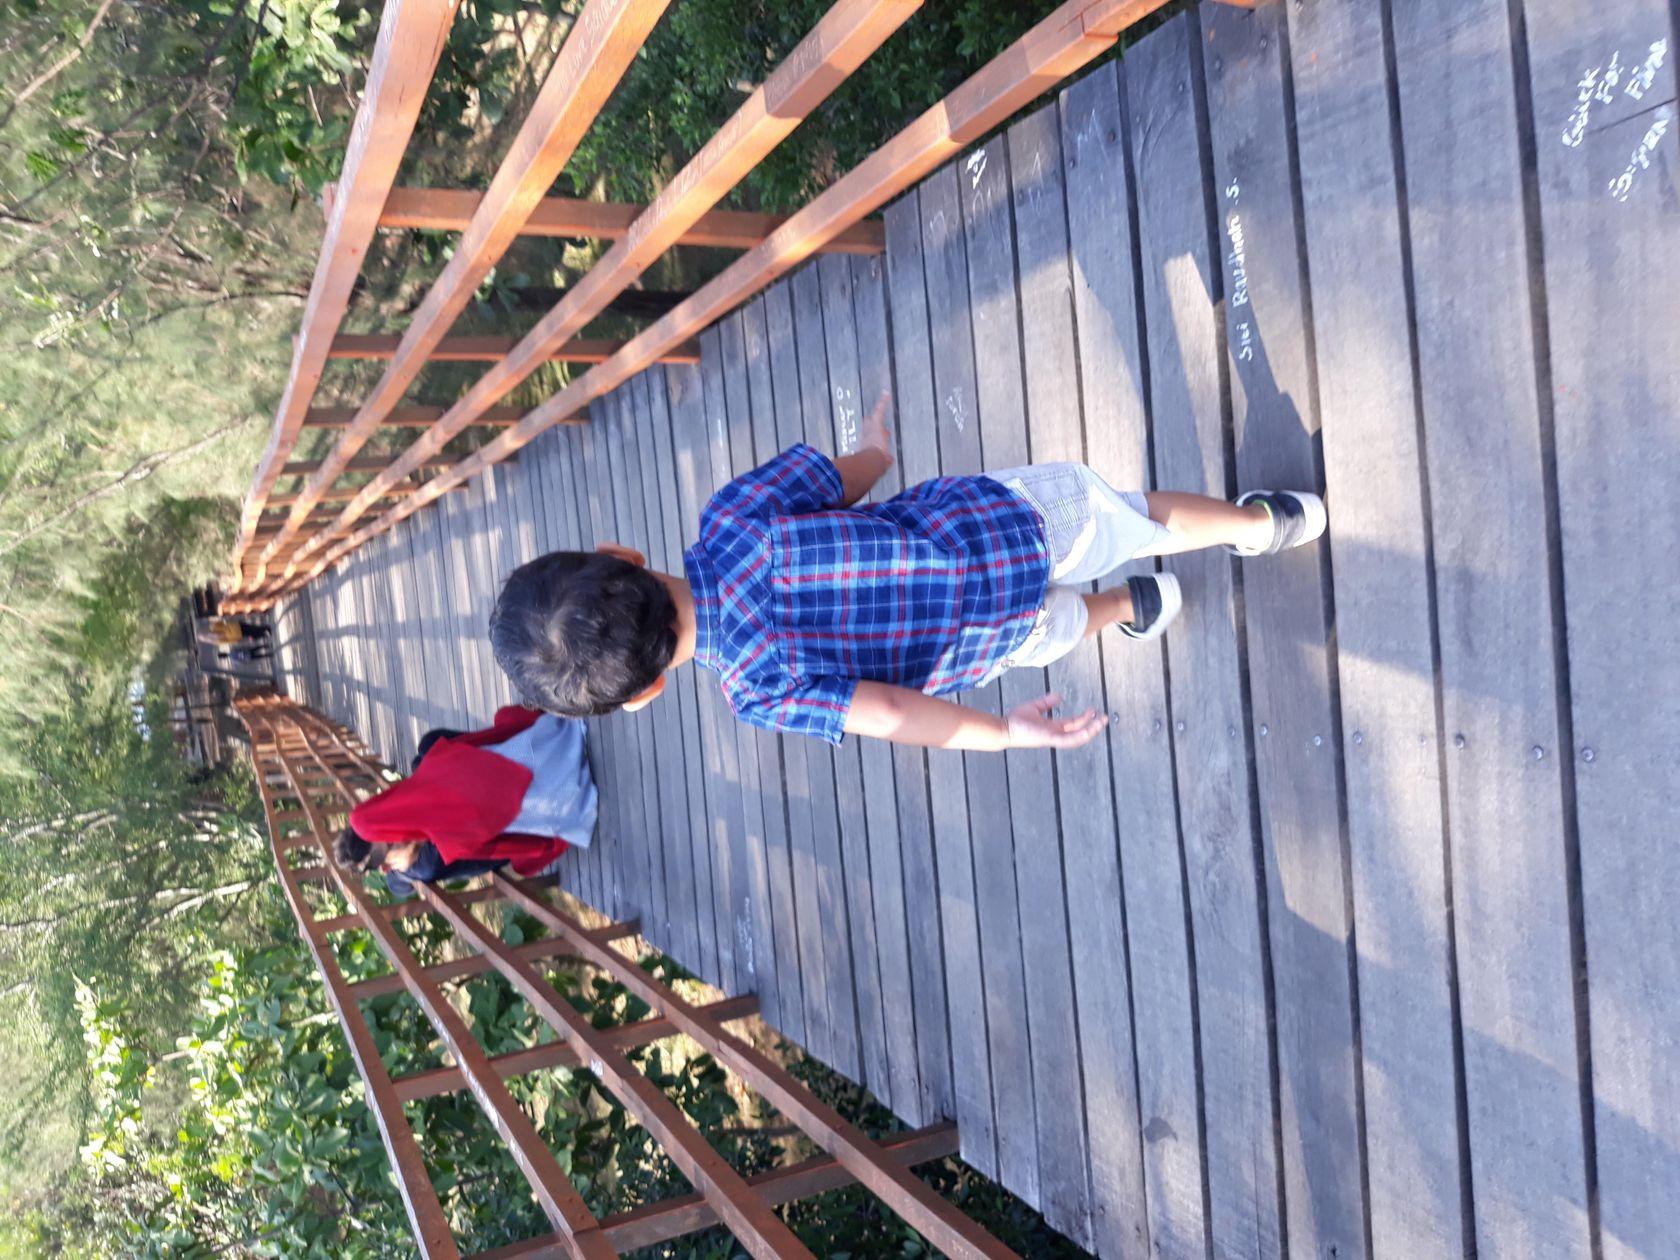 Taman Kota Sebuah Objek Wisata Steemit Namanya Hutan Bni Banda